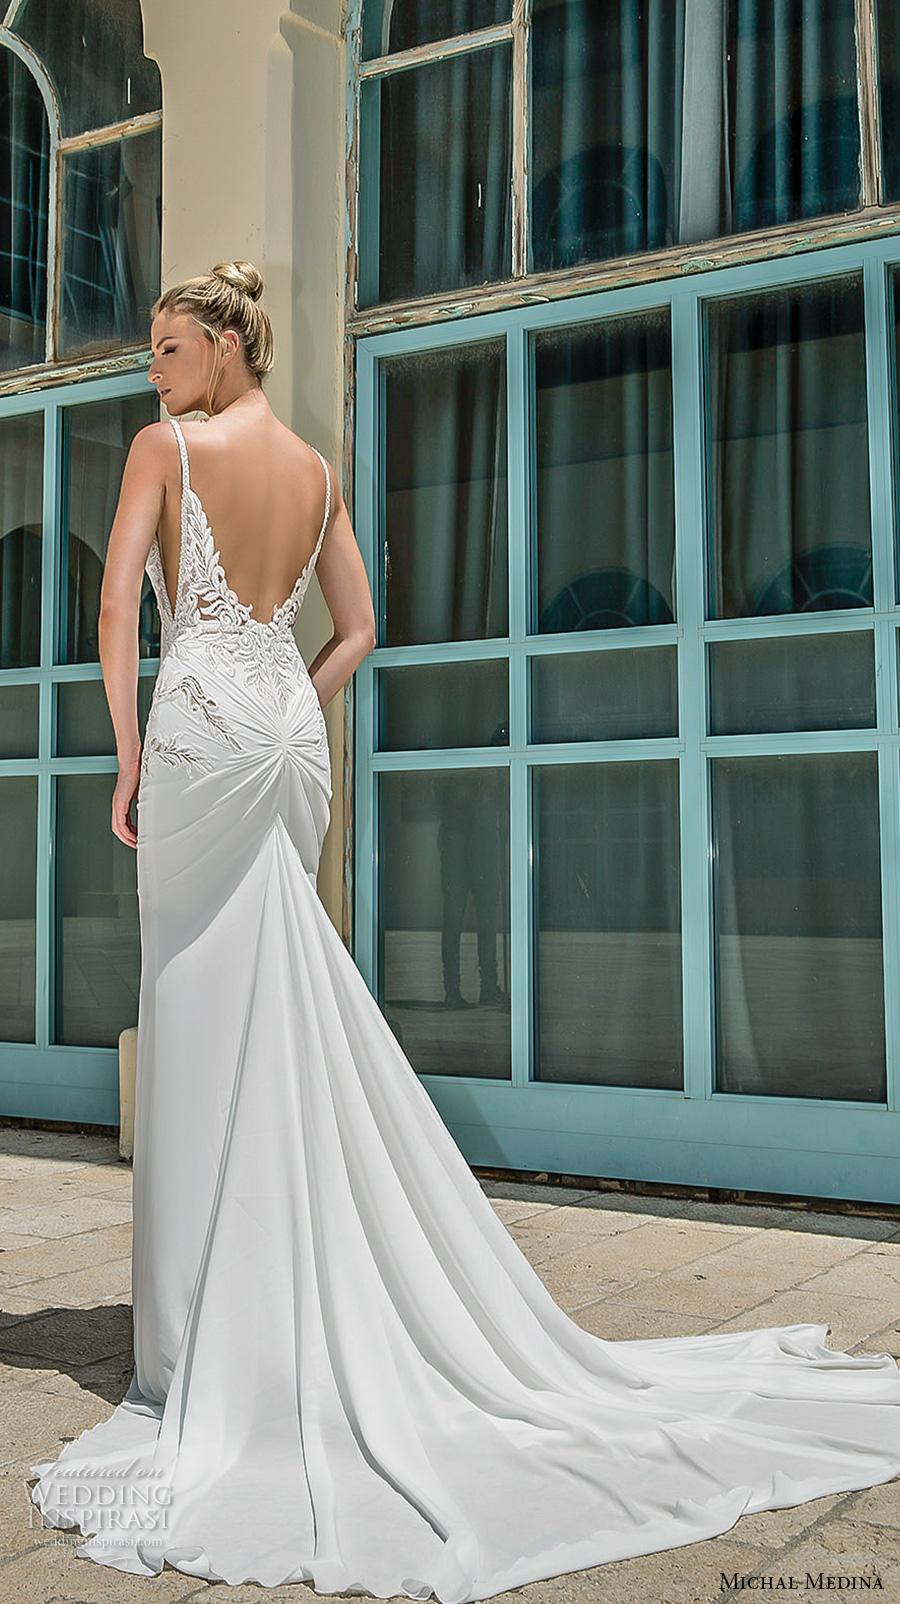 michal medina 2017 bridal spagetti strap deep plunging sweetheart neckline heavily embellished bodice elegant sheath wedding dress open low back chapel train (dianne) bv